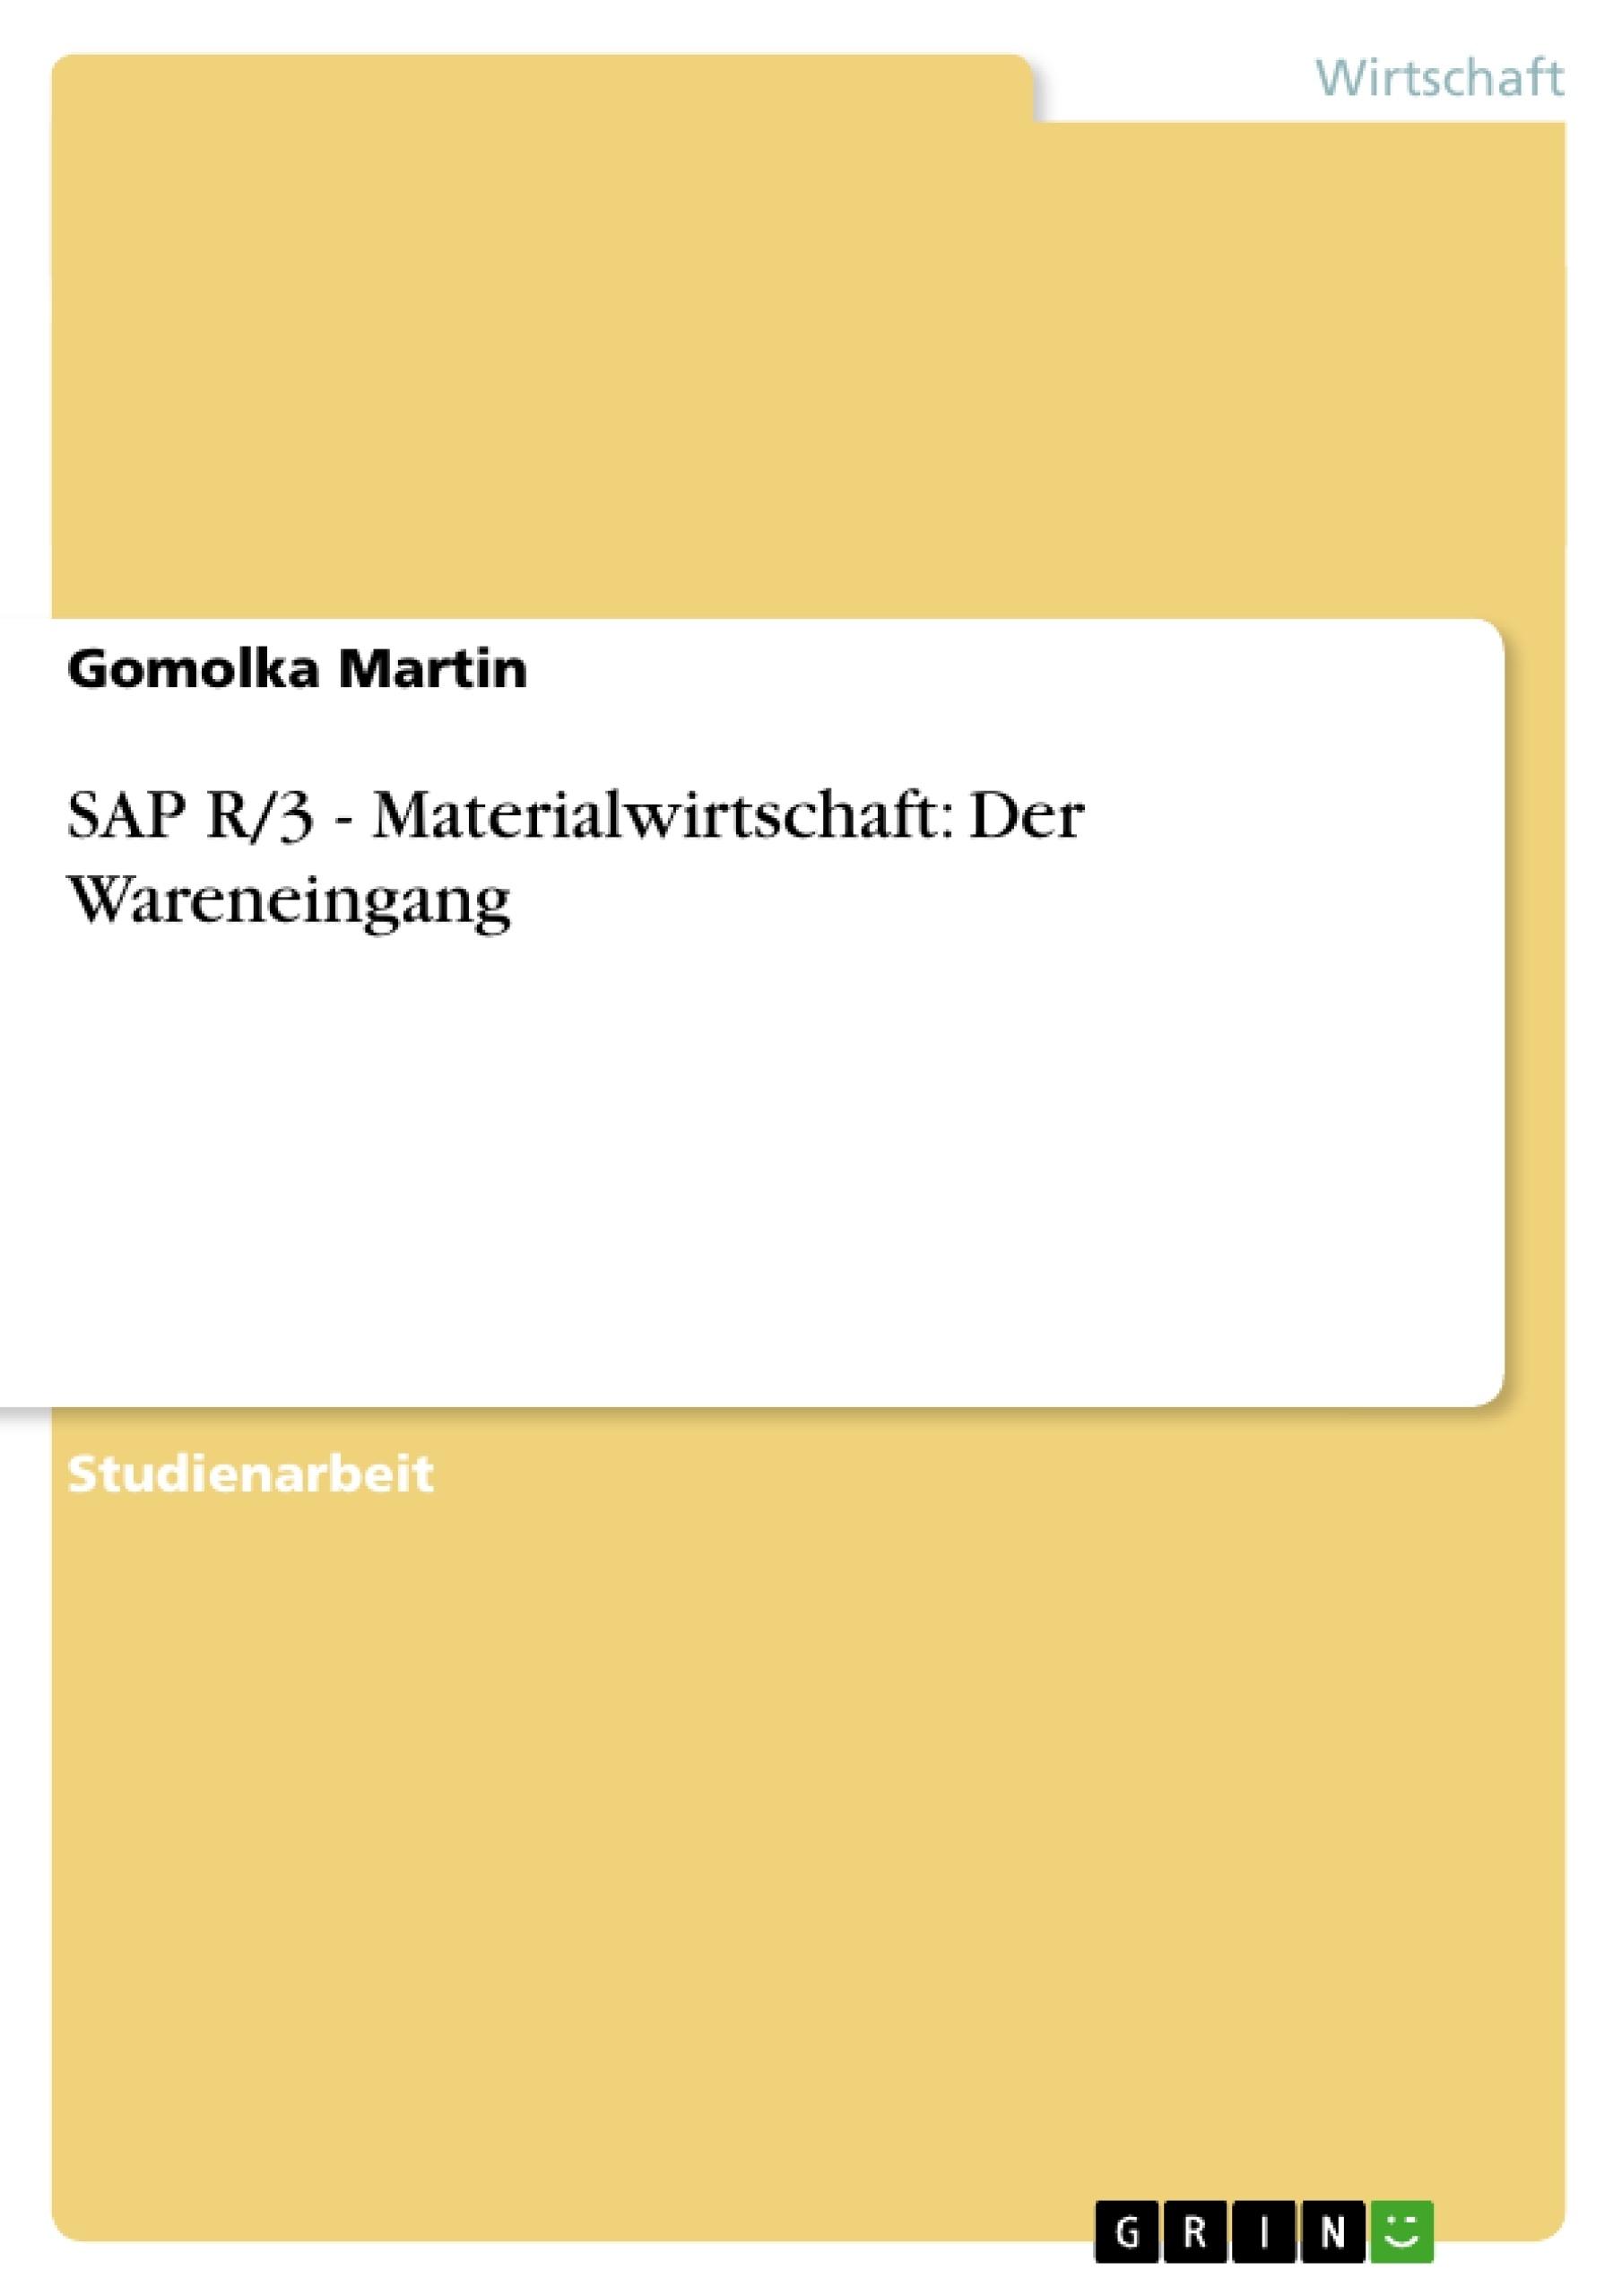 Titel: SAP R/3 - Materialwirtschaft: Der Wareneingang